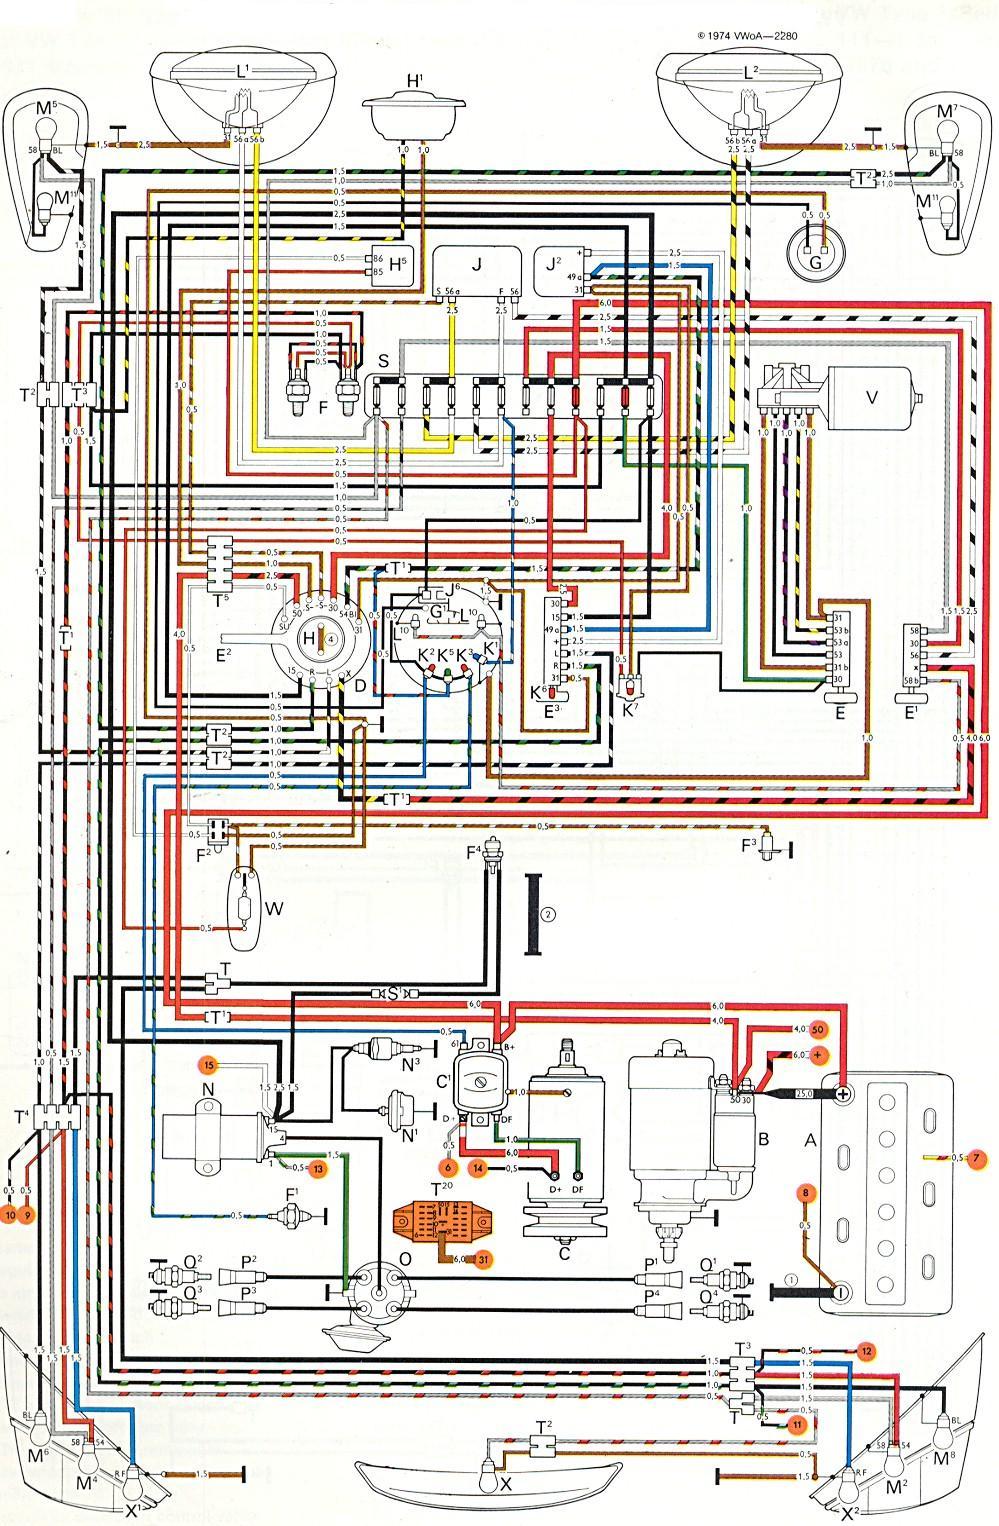 1972 Vw Beetle Engine Diagram - wiring diagram on the net  Vw Beetle Wiring Diagrams on